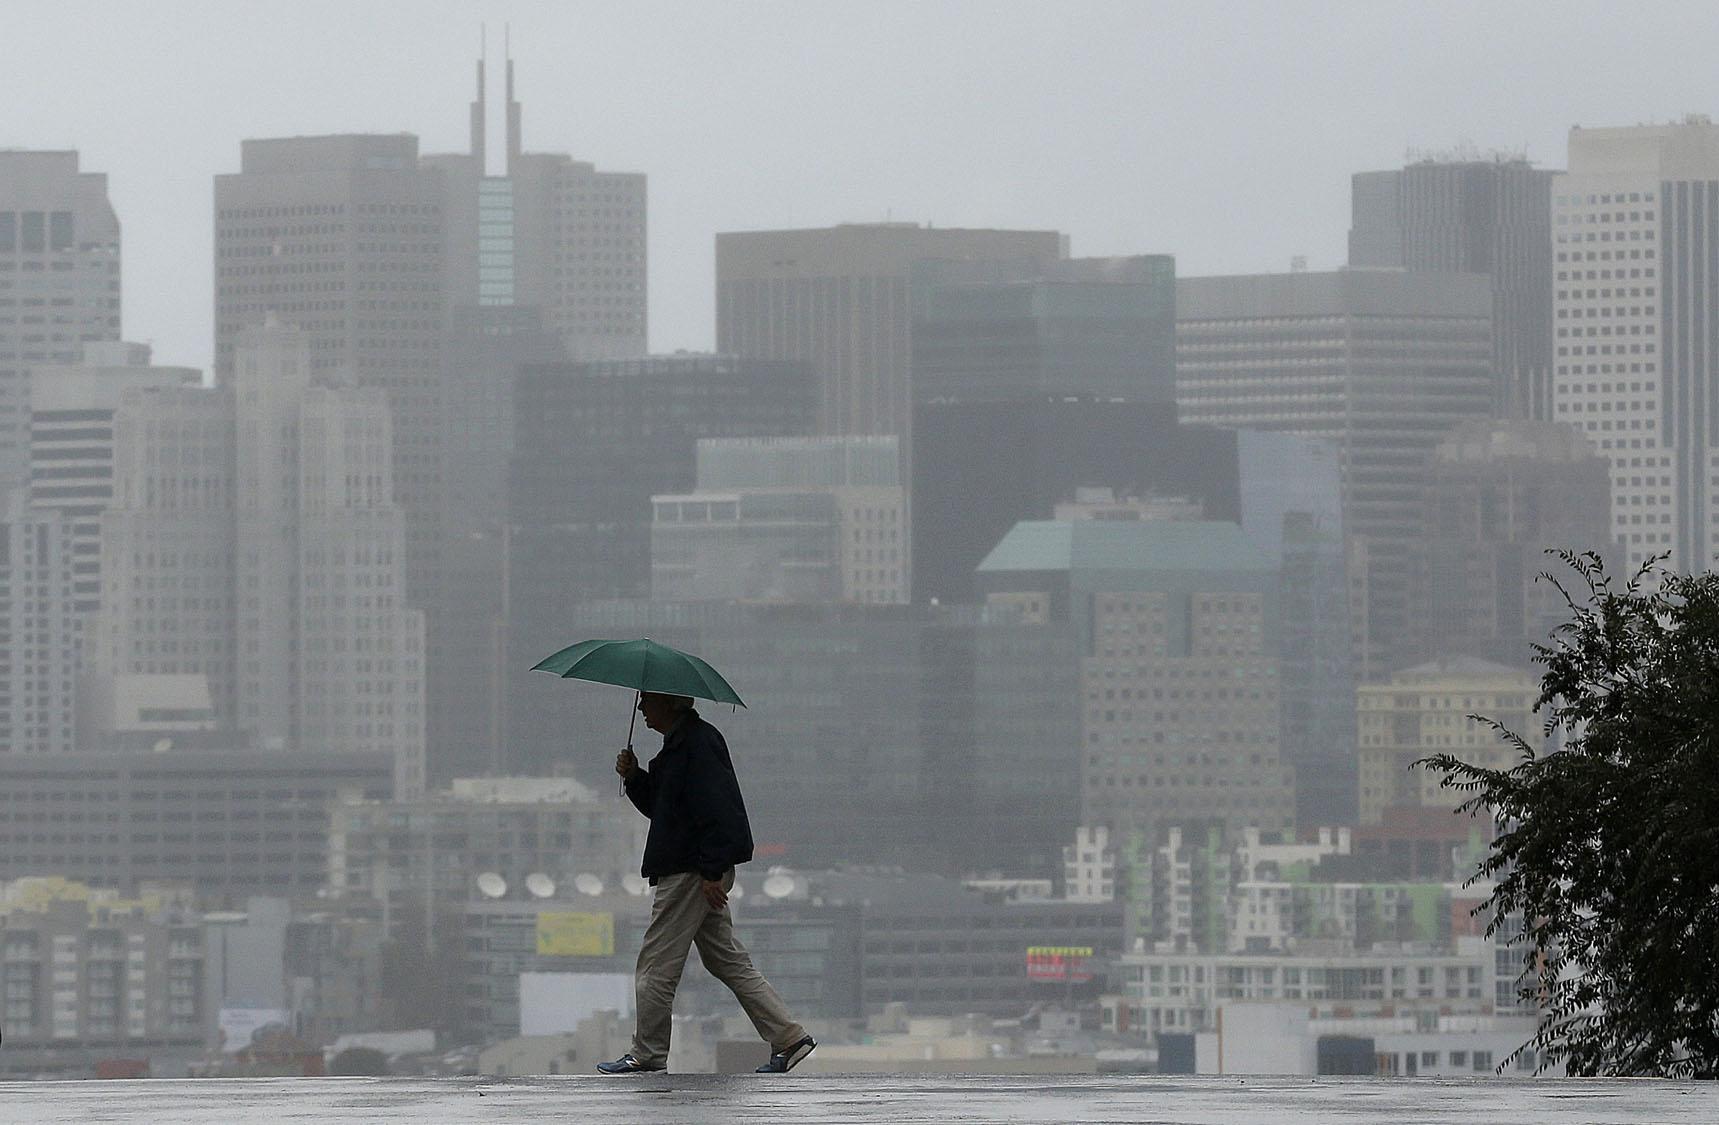 el nino storms hit the west coast